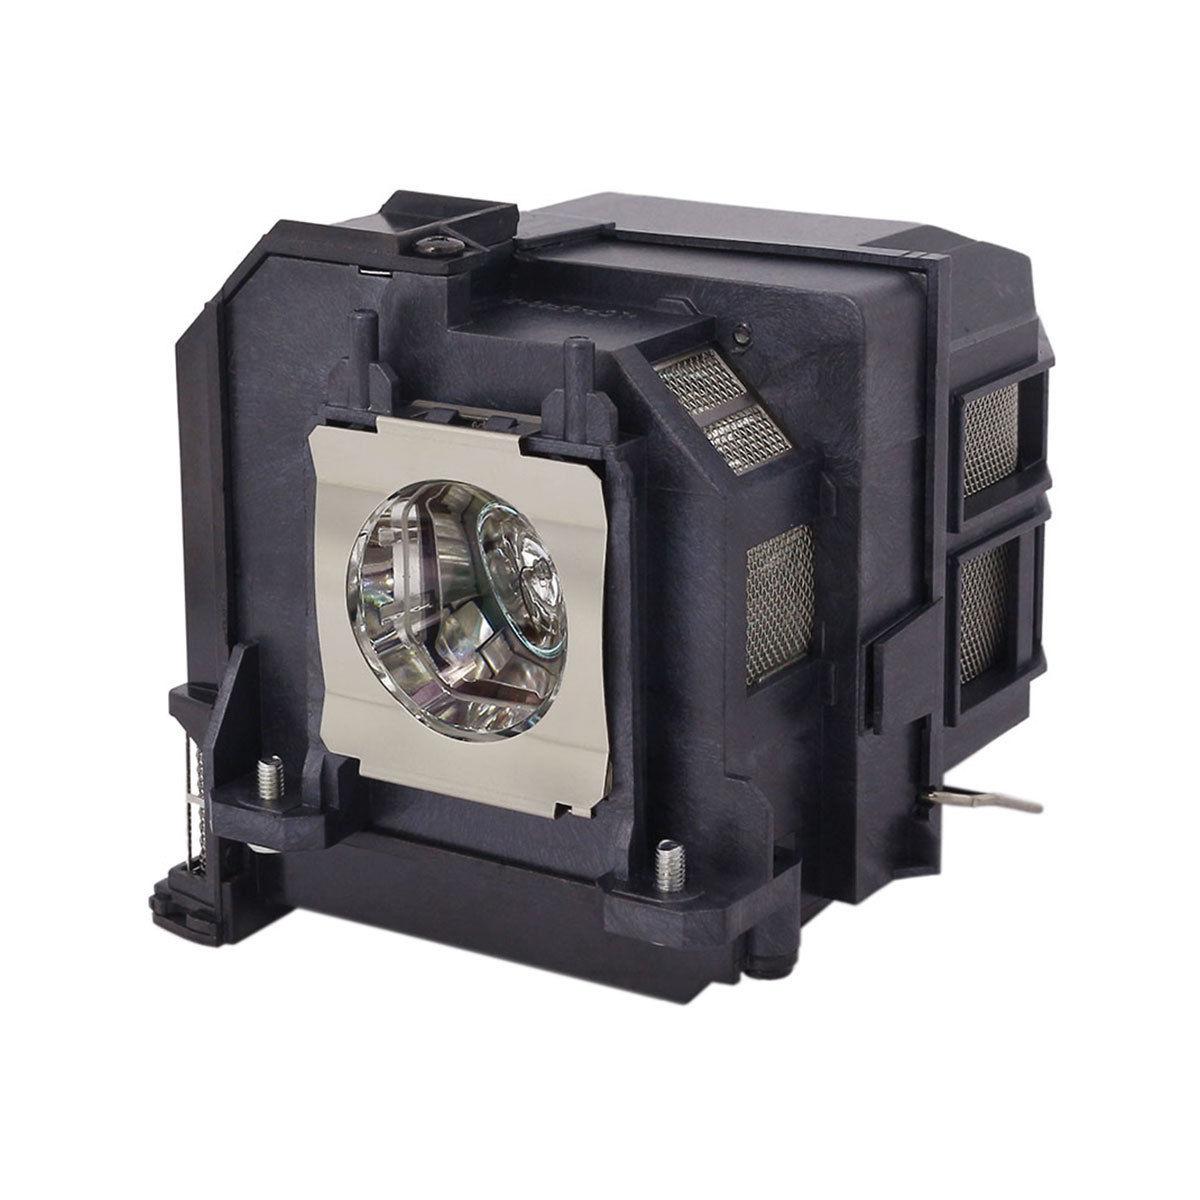 Projector Lamp Bulb ELP80 V13H010L80 for Epson PowerLite 580 585W/ BrightLink 585Wi 595Wi/ EB-1420Wi EB-580 EB-595Wi With CaseProjector Lamp Bulb ELP80 V13H010L80 for Epson PowerLite 580 585W/ BrightLink 585Wi 595Wi/ EB-1420Wi EB-580 EB-595Wi With Case